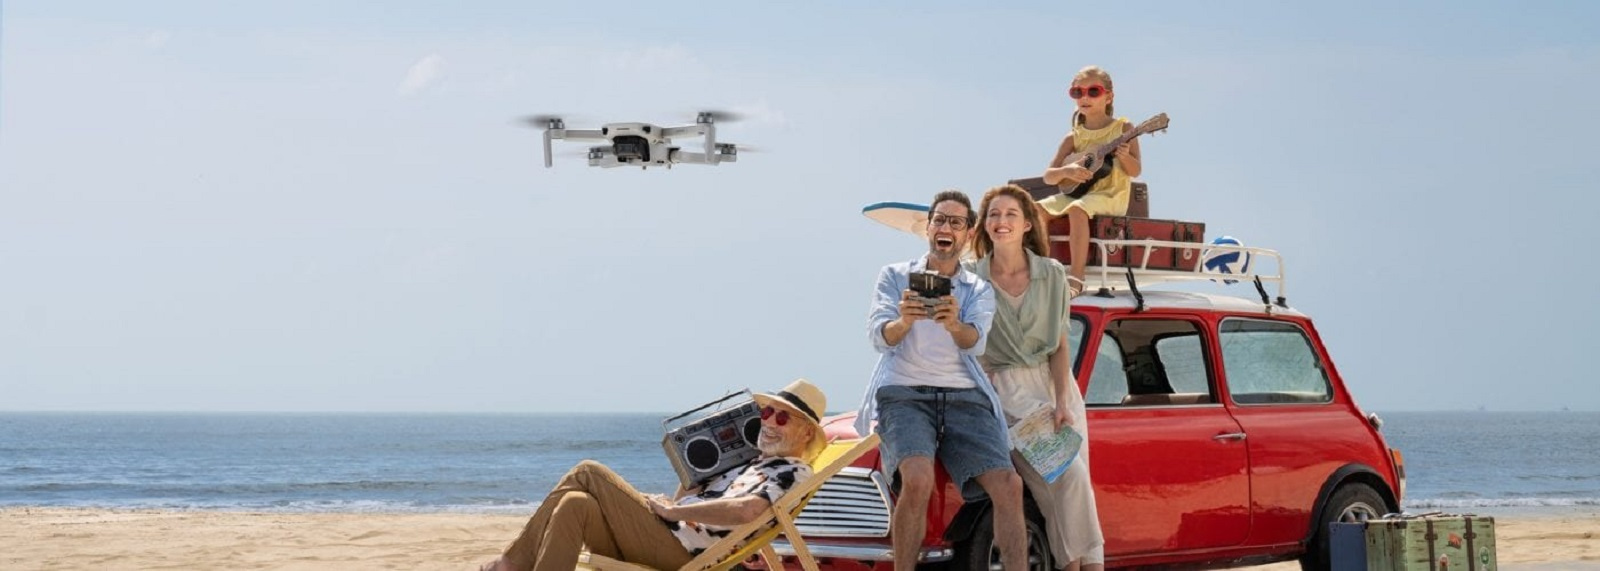 Mini 2 официально выпущен крупнейшим в мире производителем дронов DJI